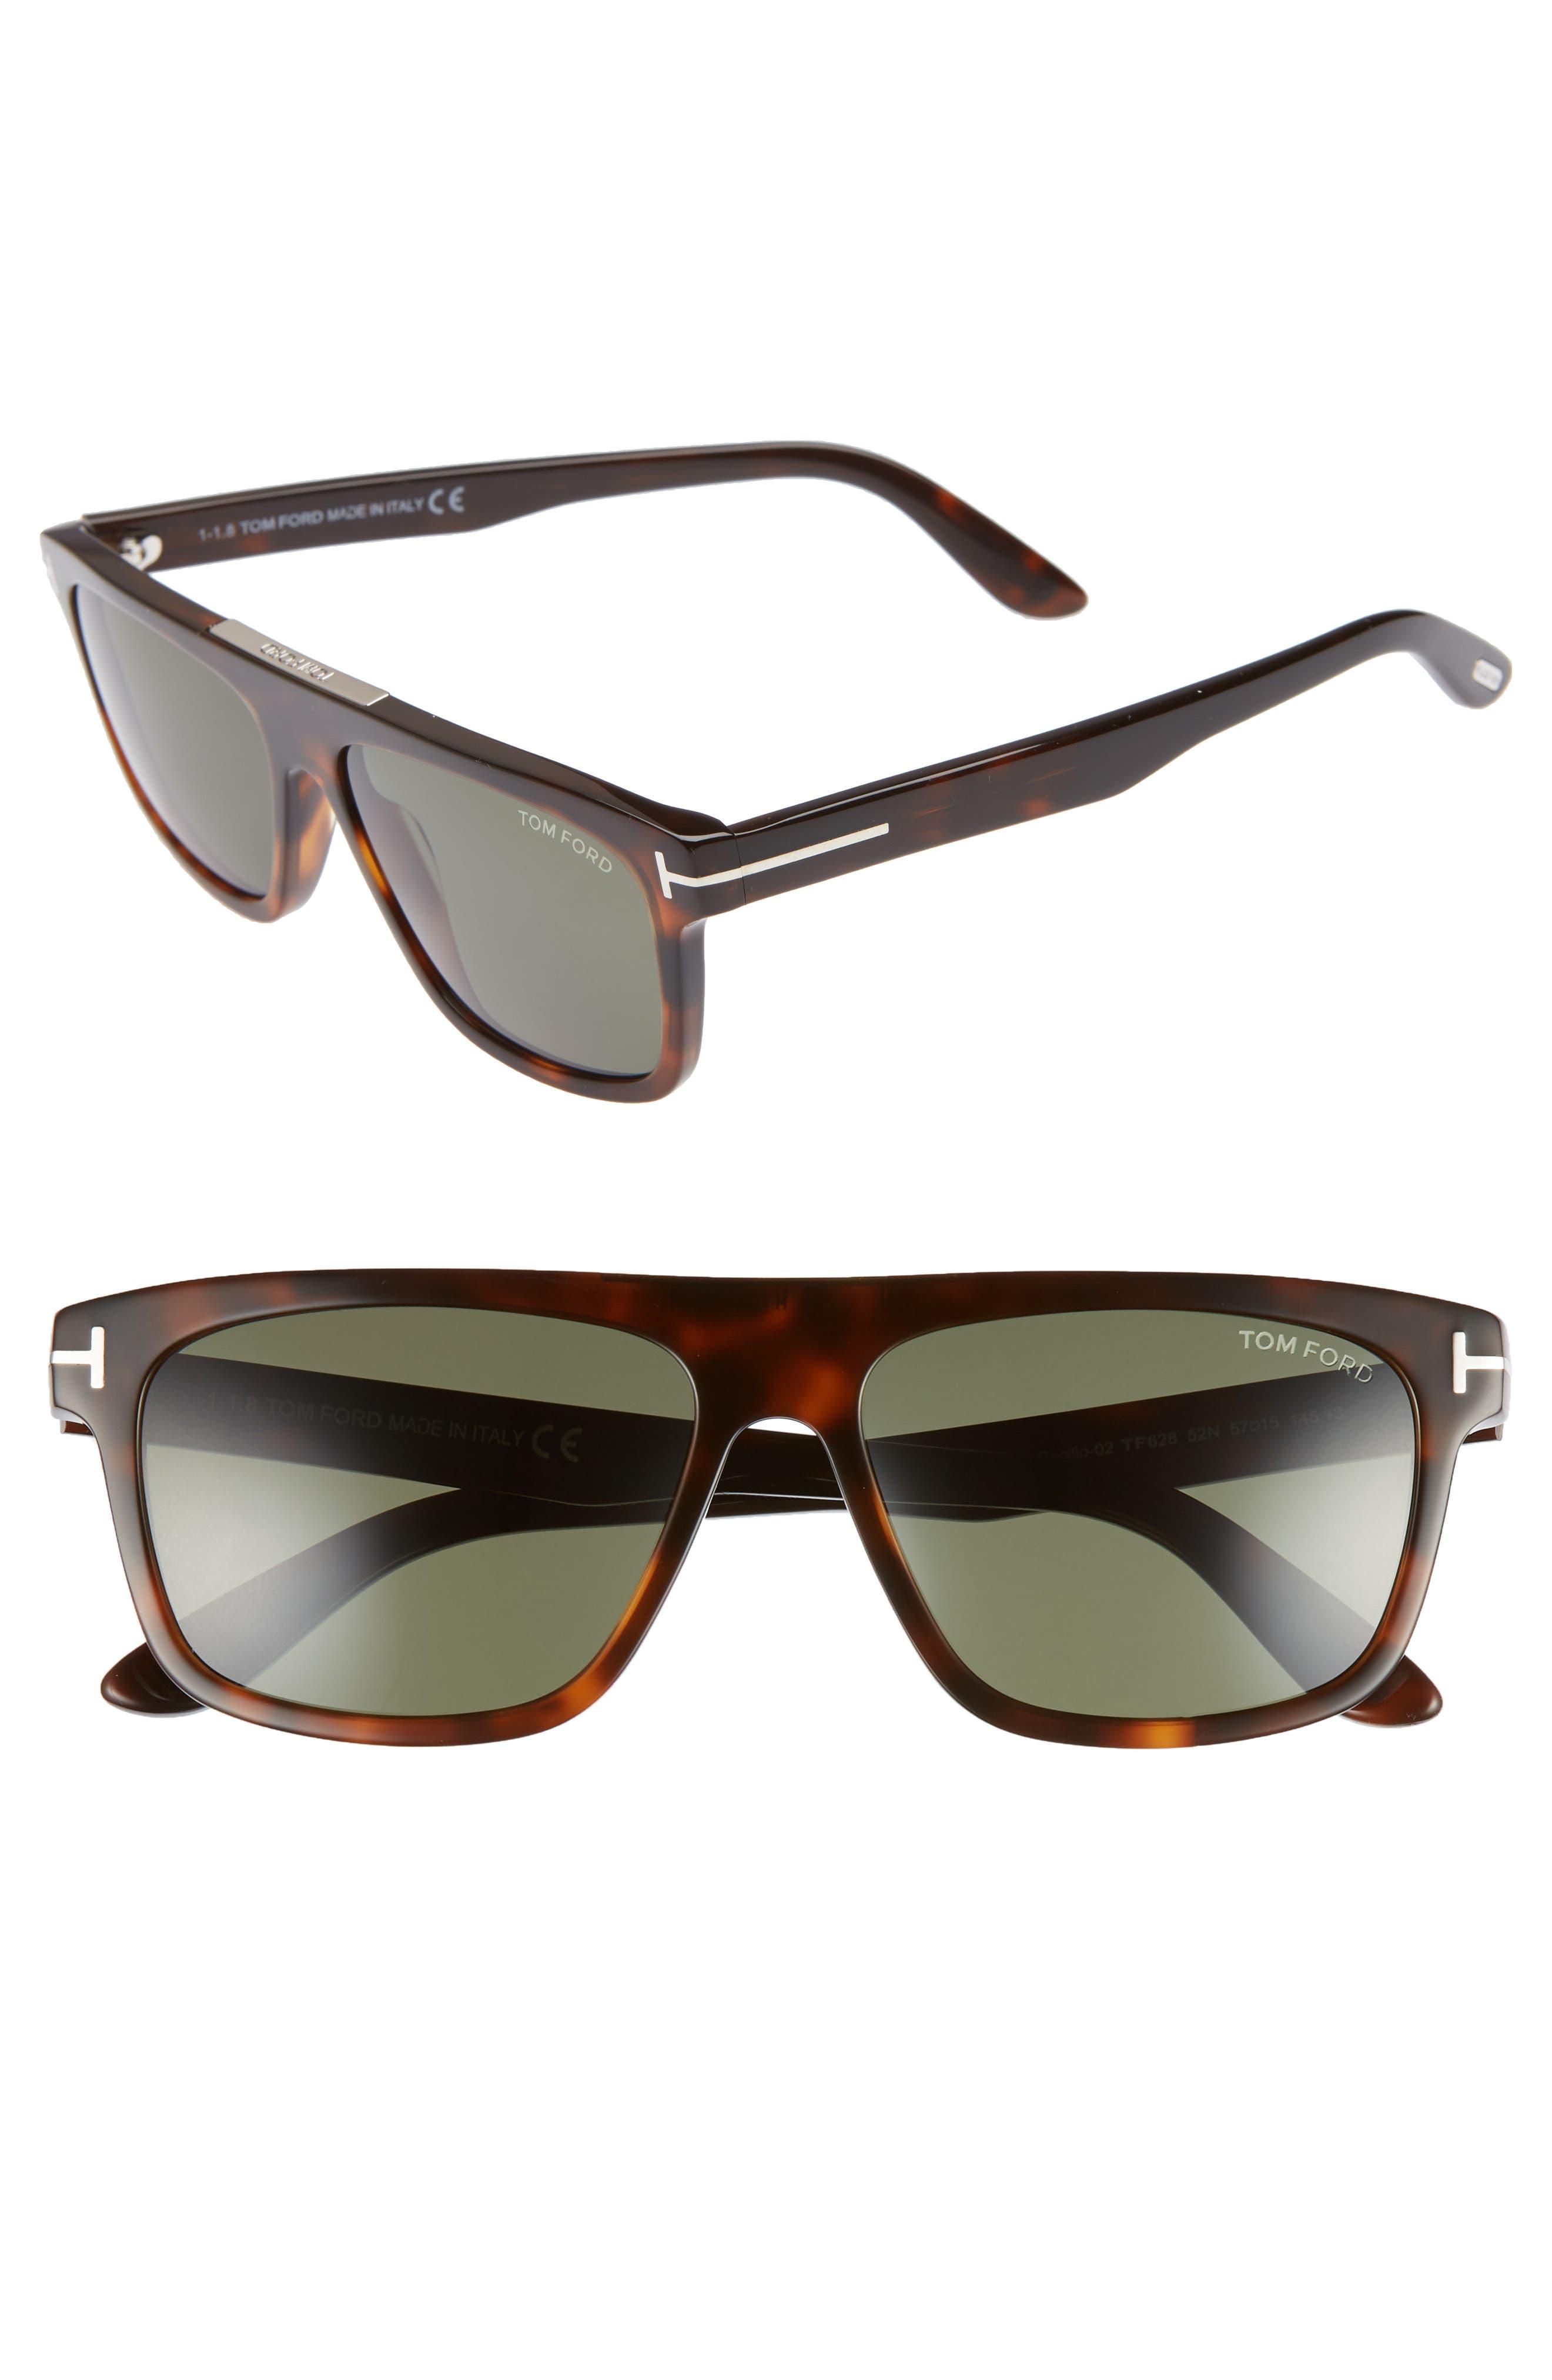 Cecilio 57mm Blue Block Optical Glasses,                             Main thumbnail 1, color,                             DARK HAVANA/ GREEN